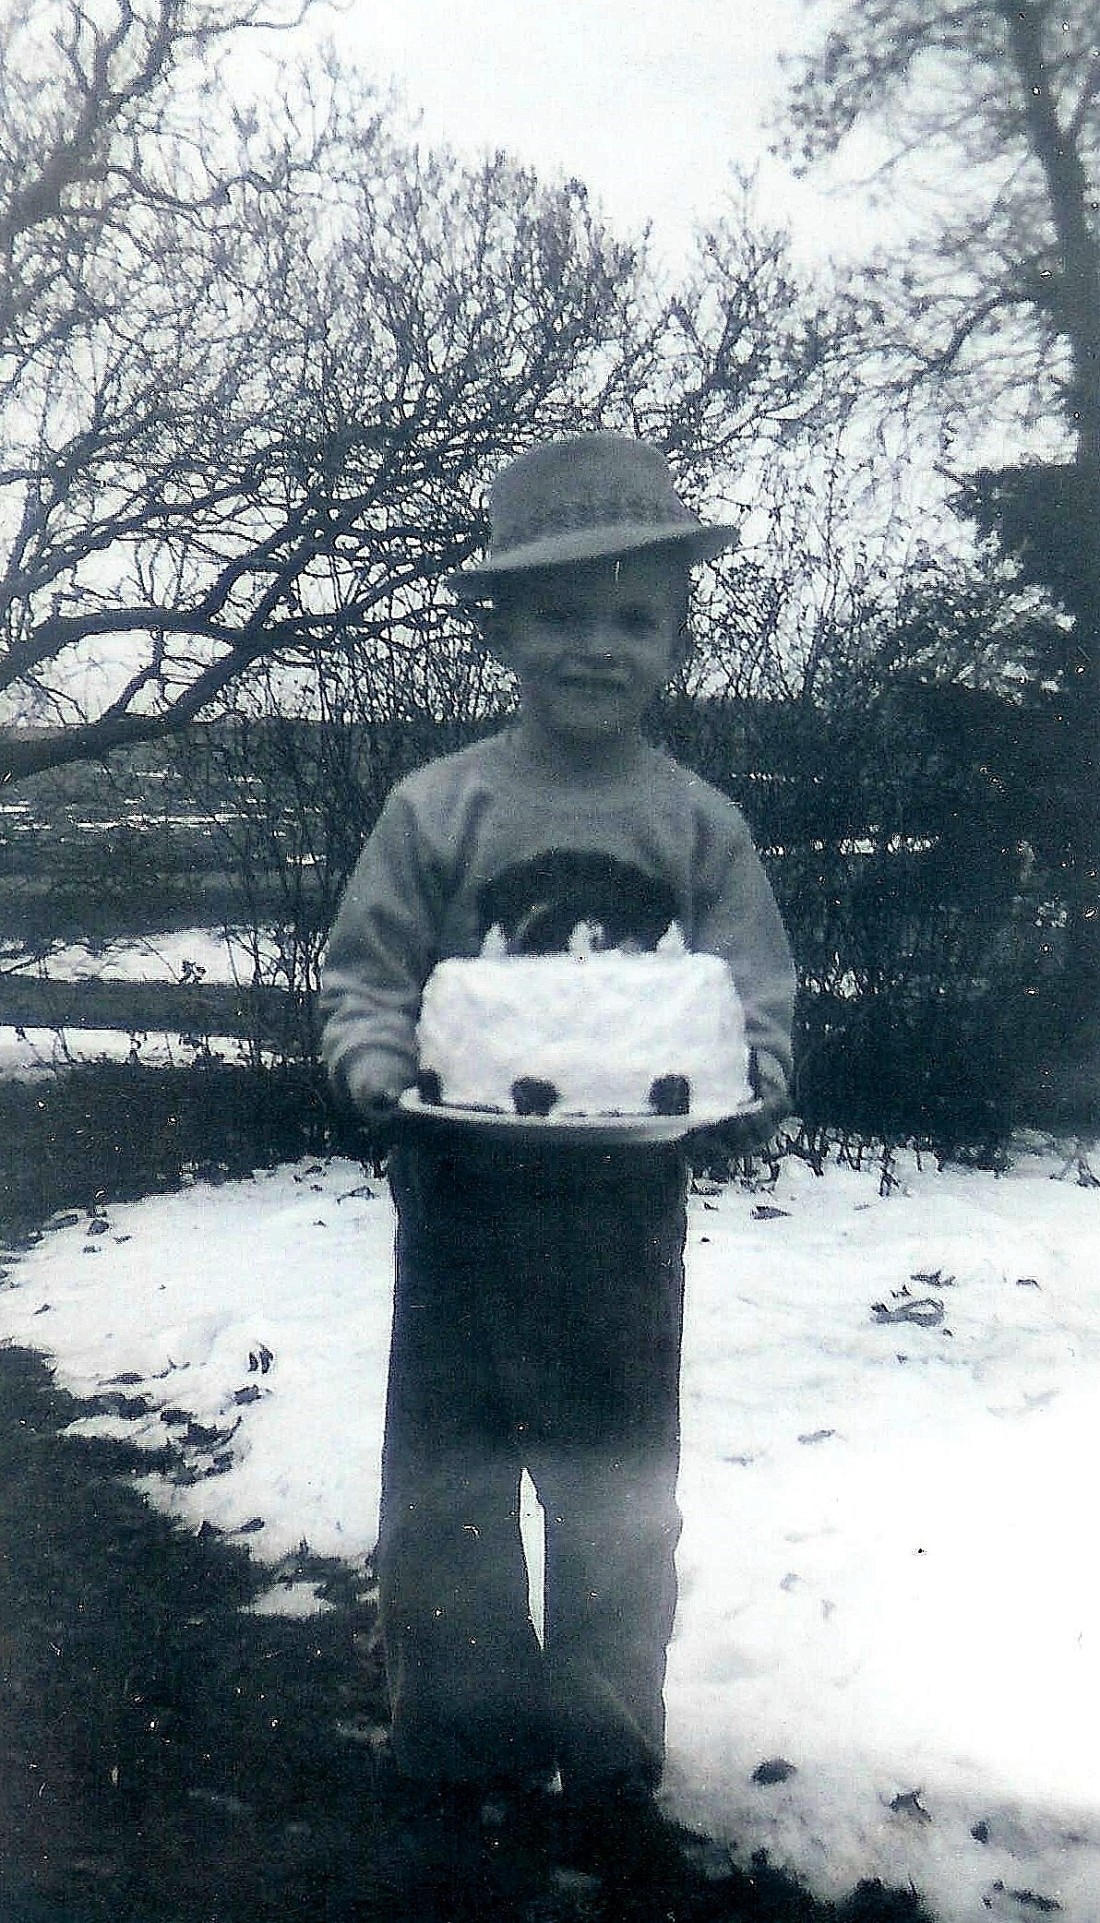 #107=Elliott with fedora hat on 6th BD; January 14, 1960